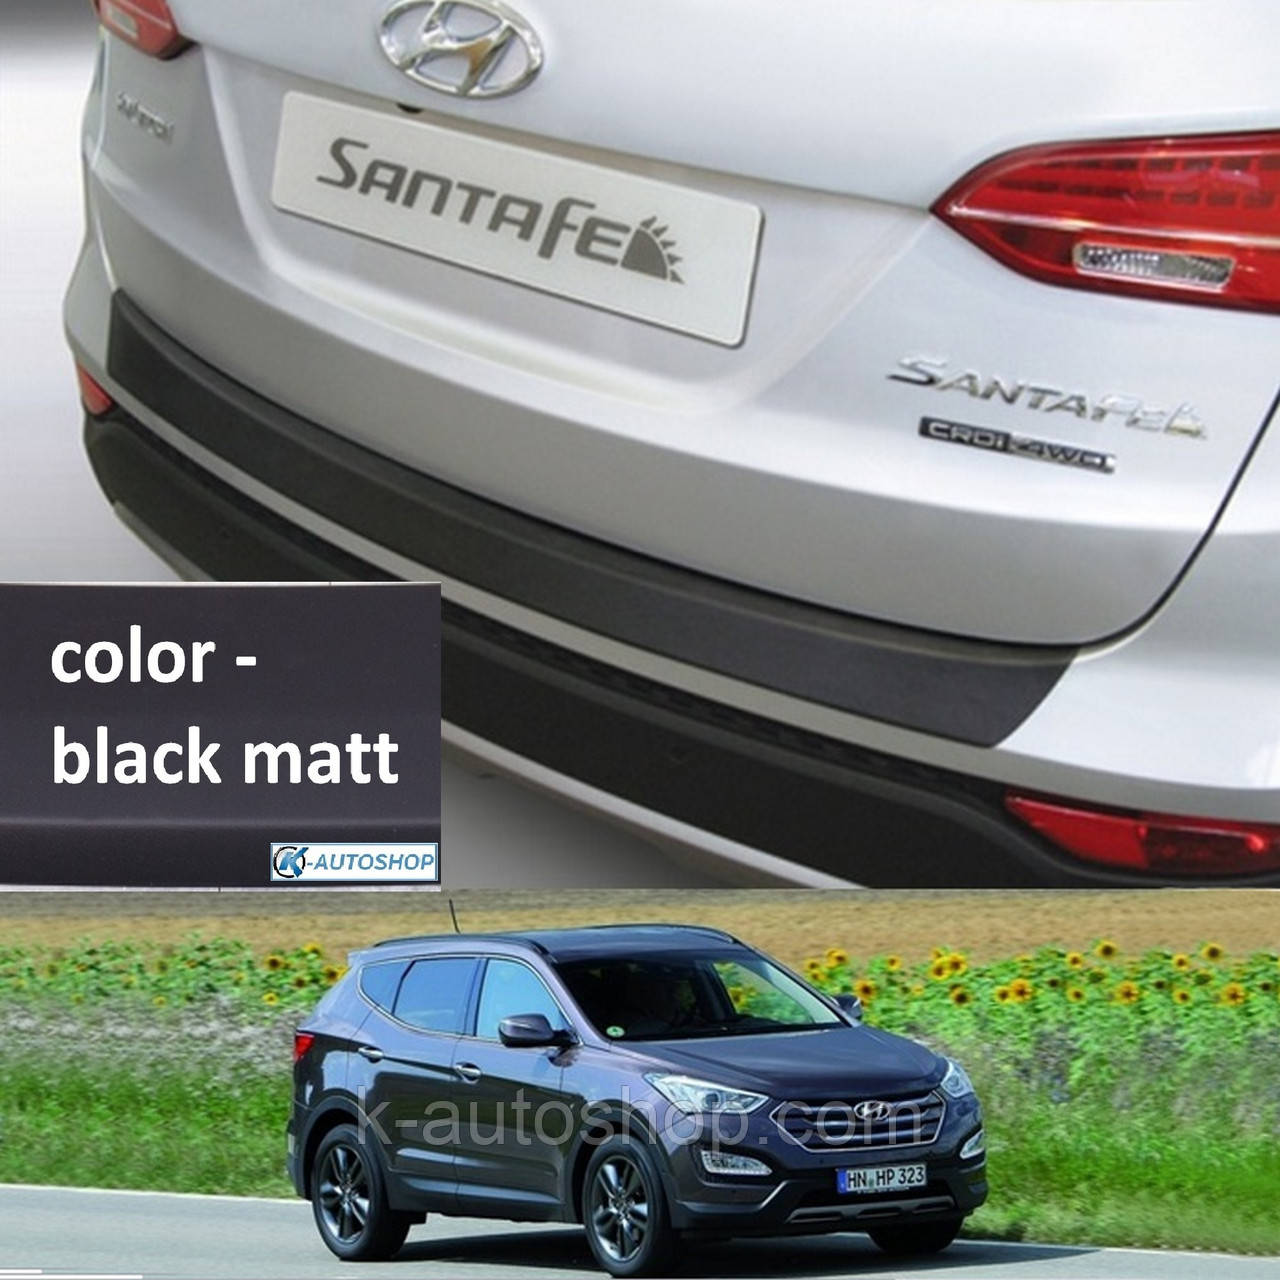 Пластикова захисна накладка на задній бампер для Hyundai Santa Fe Mk3 2012-2015